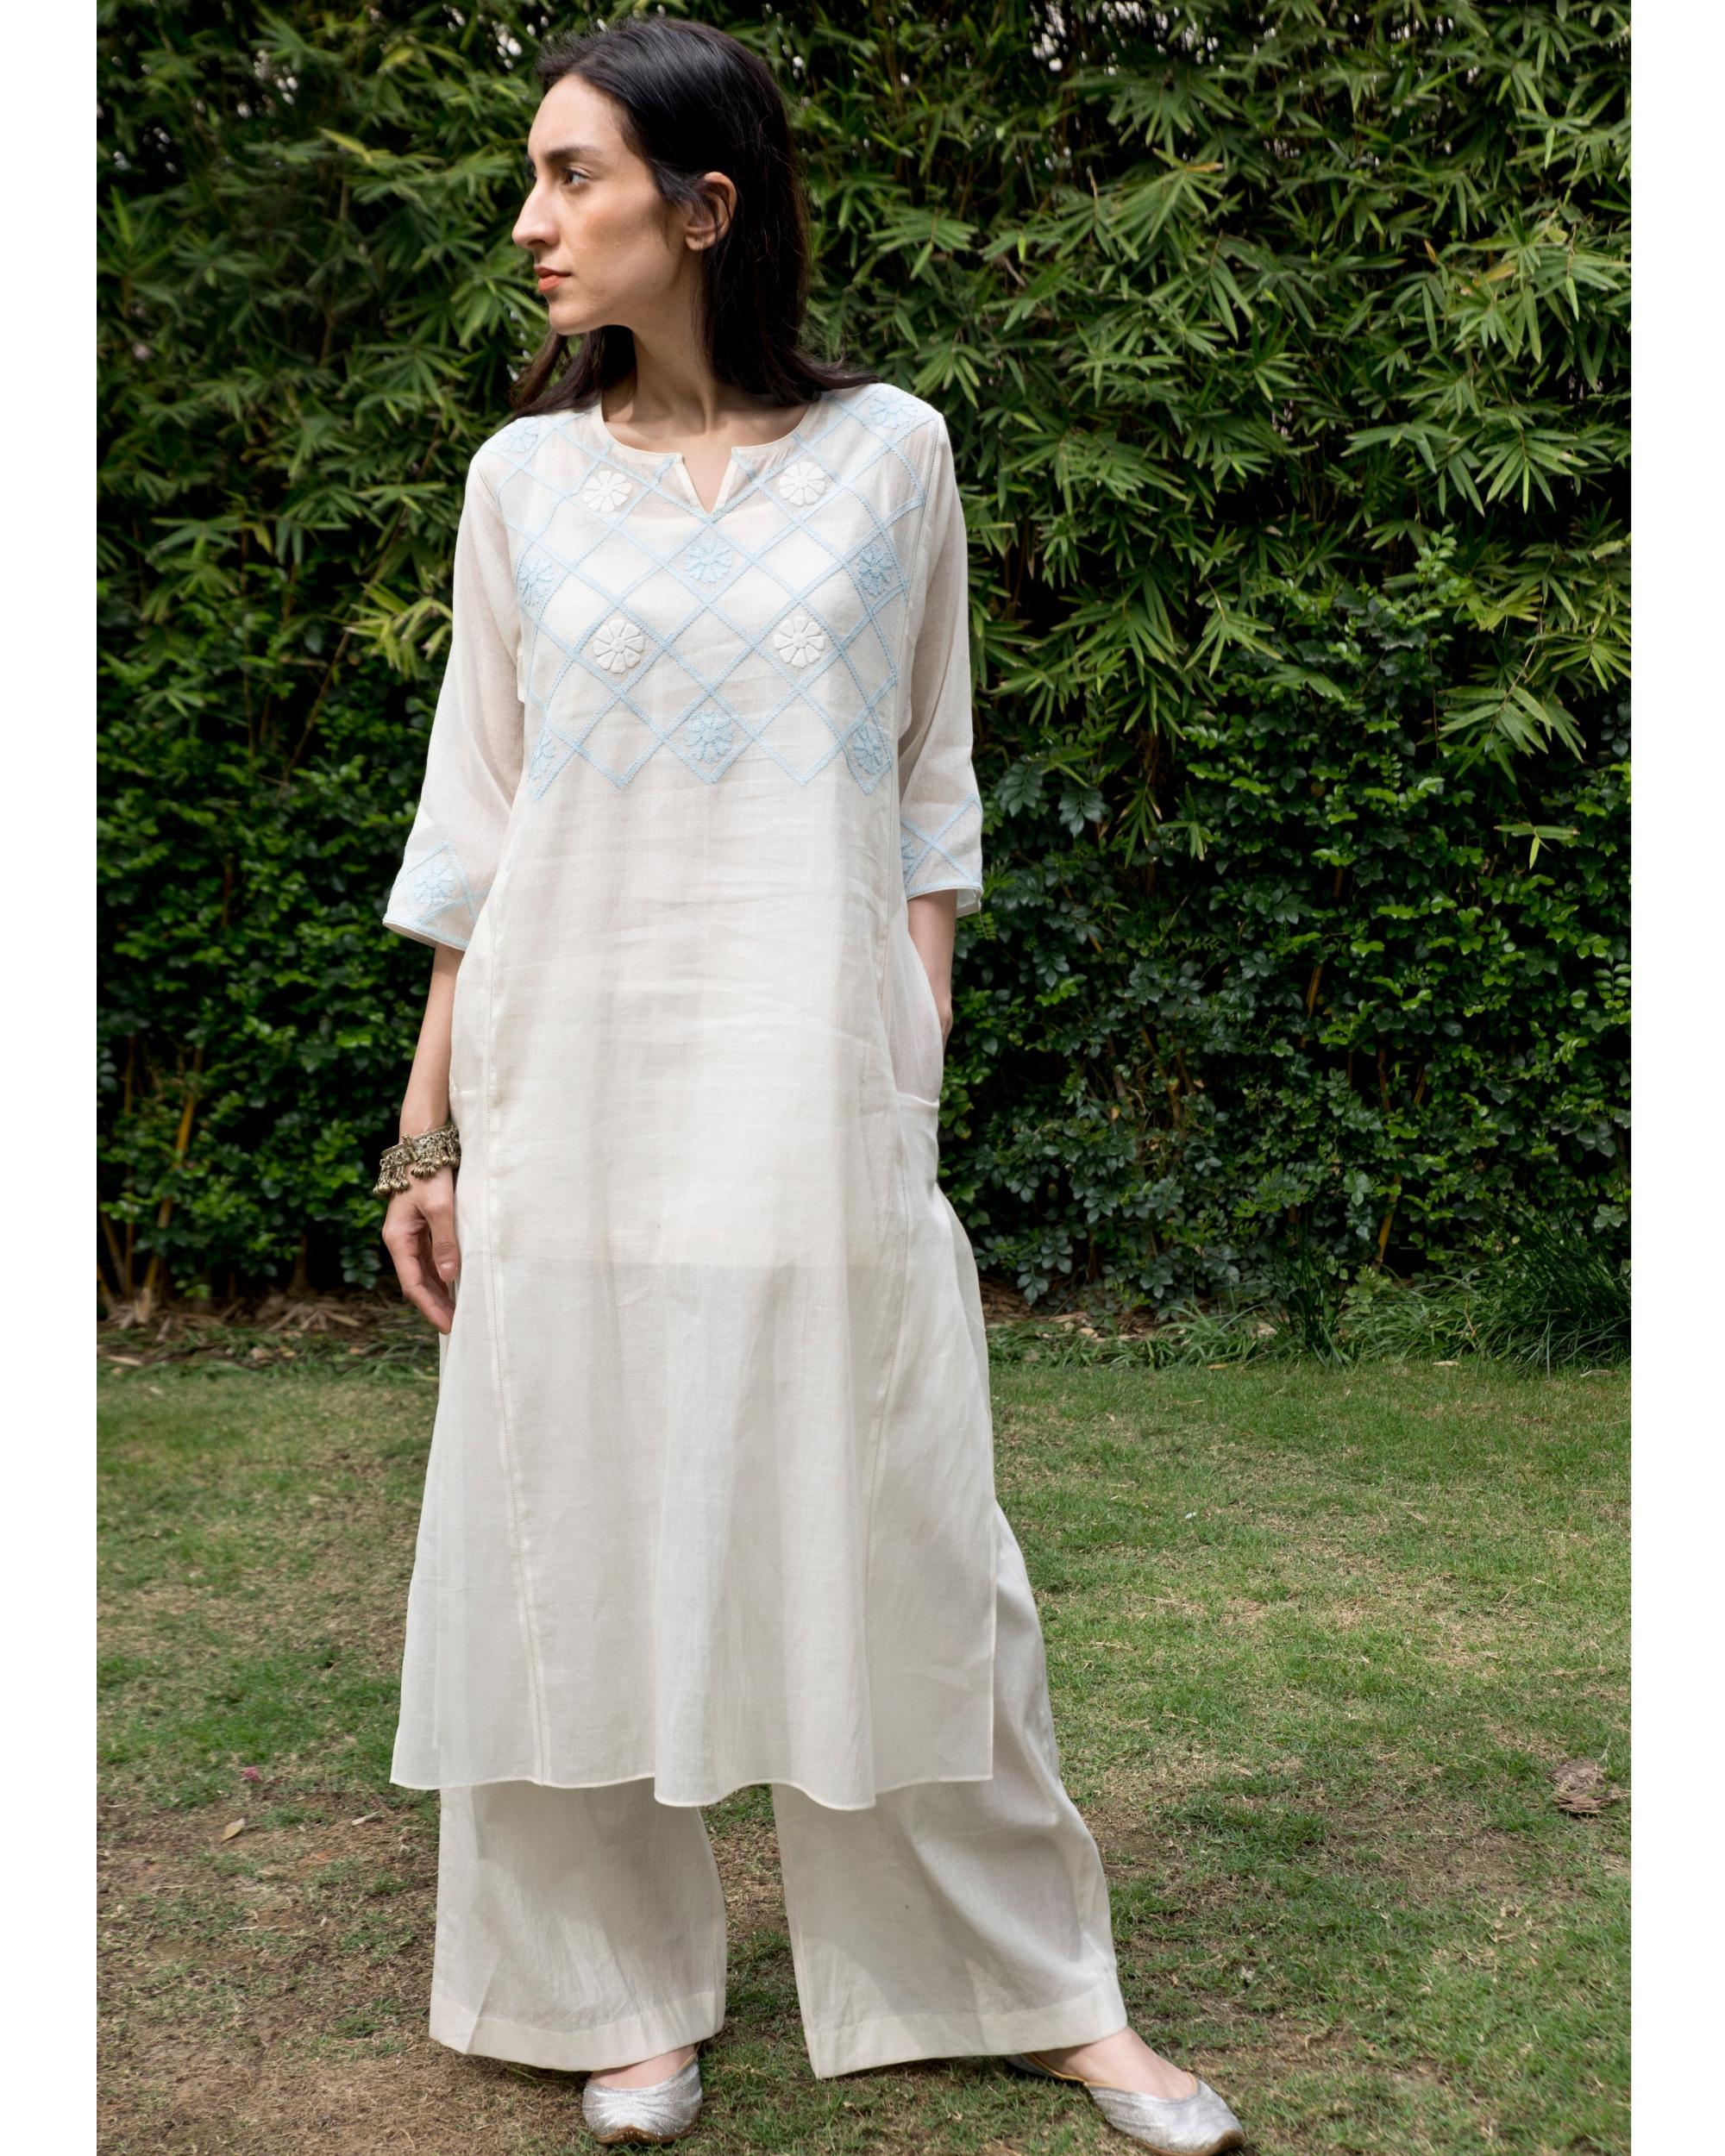 Off white and powder blue checkered yoke kalidar kurta